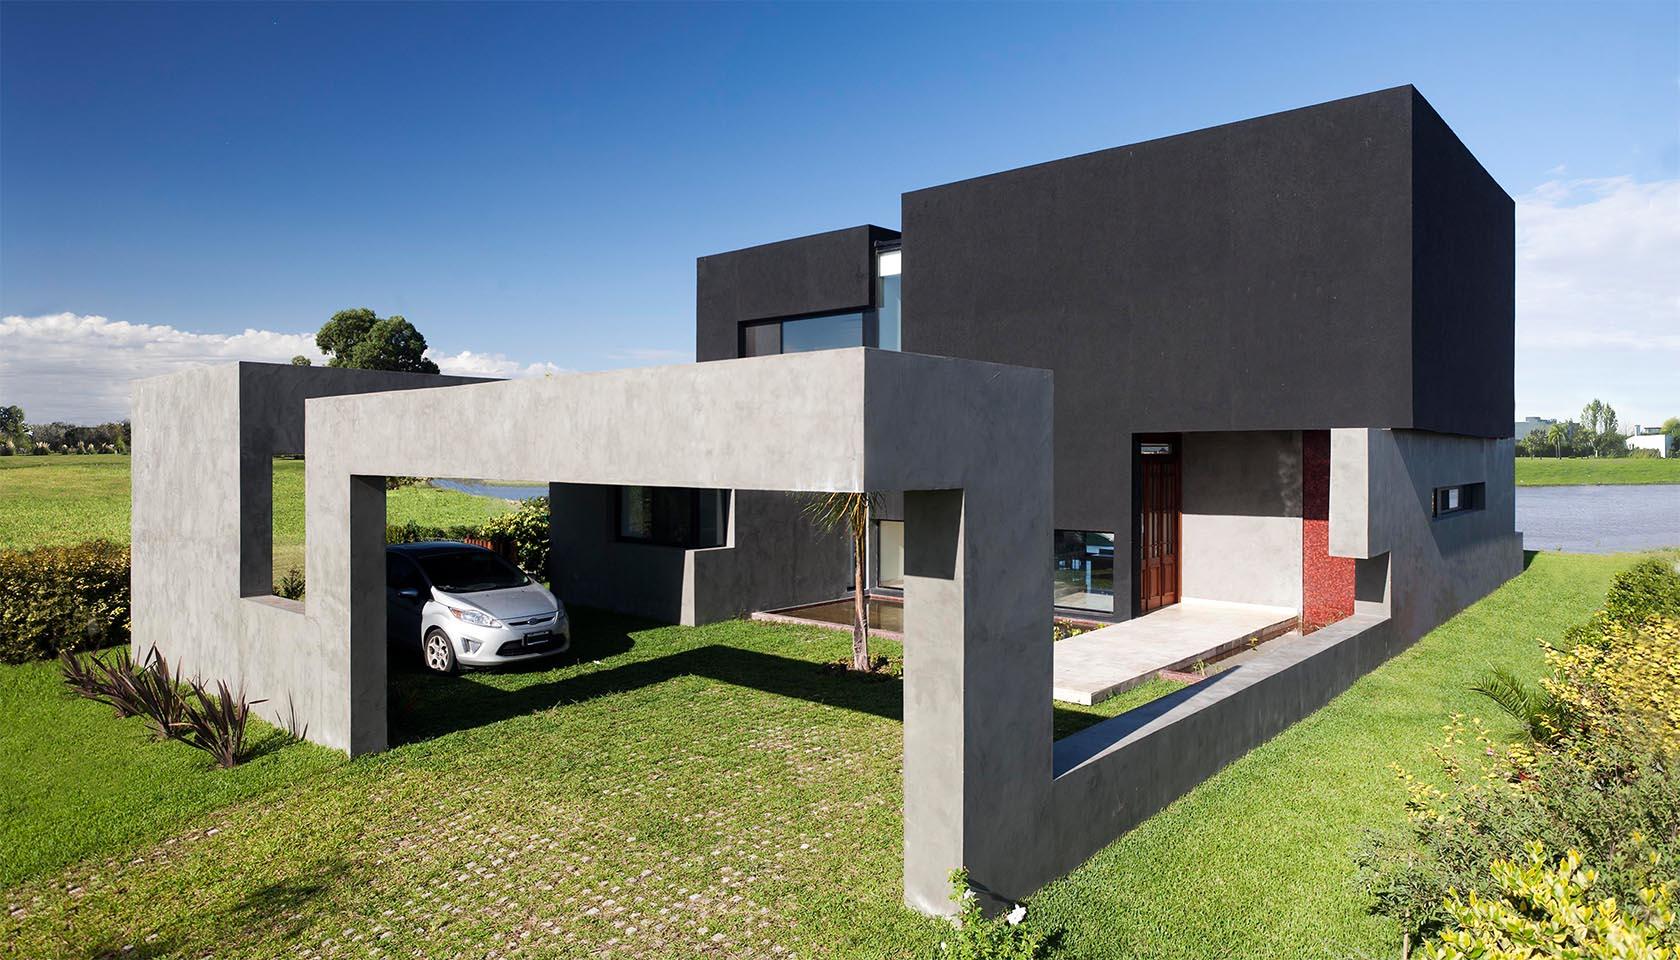 casas modernas, casas negras, arquitectura contemporánea